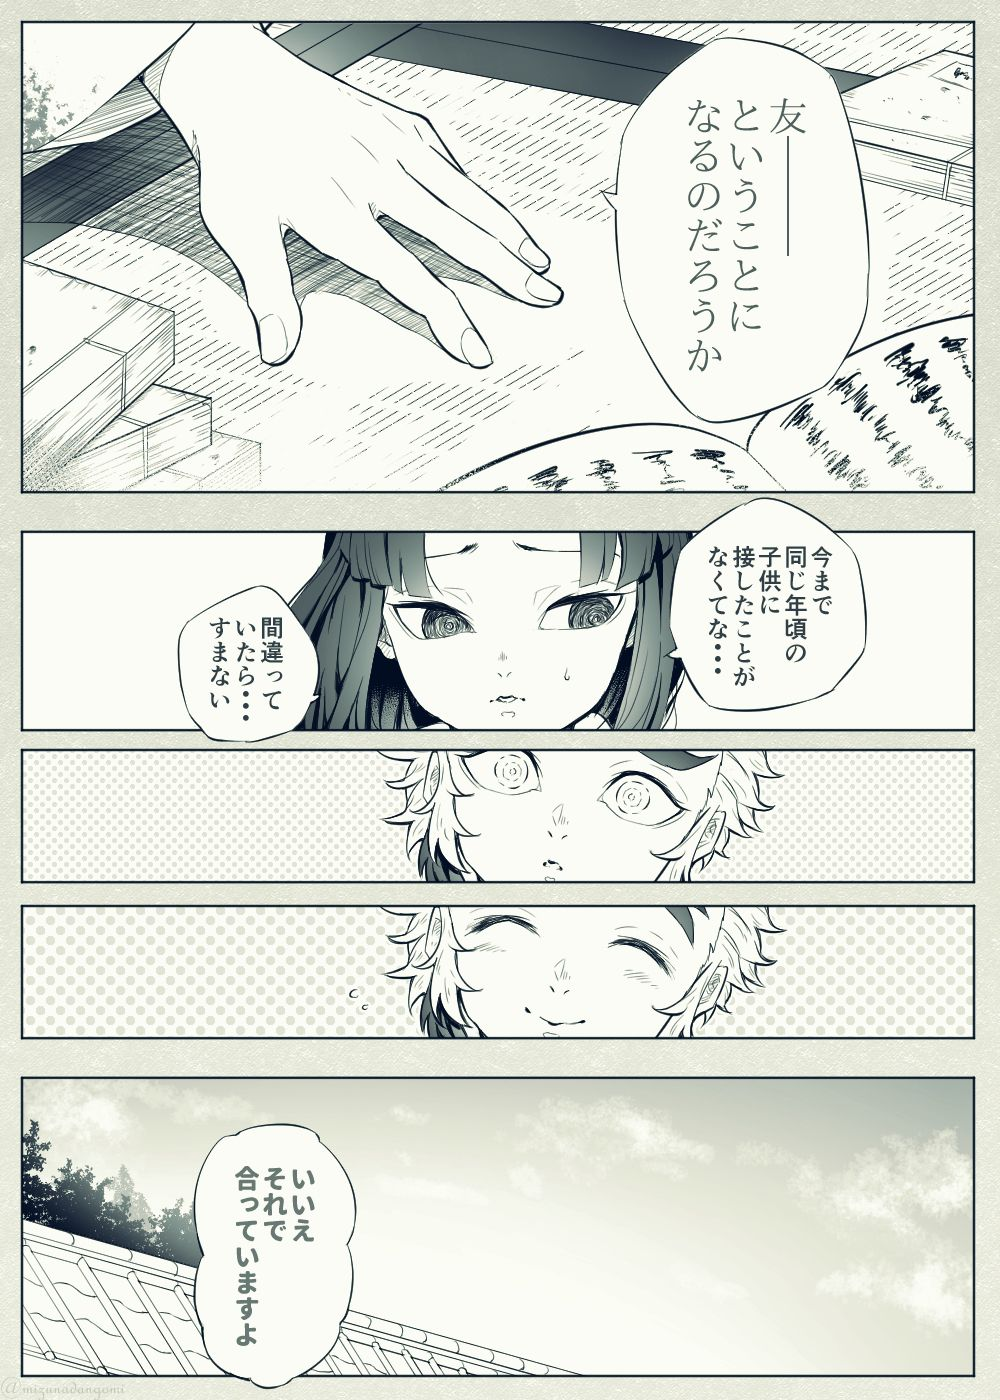 kimetsu no yaiba おしゃれまとめの人気アイデア pinterest volleyball 産屋敷 漫画 煉獄